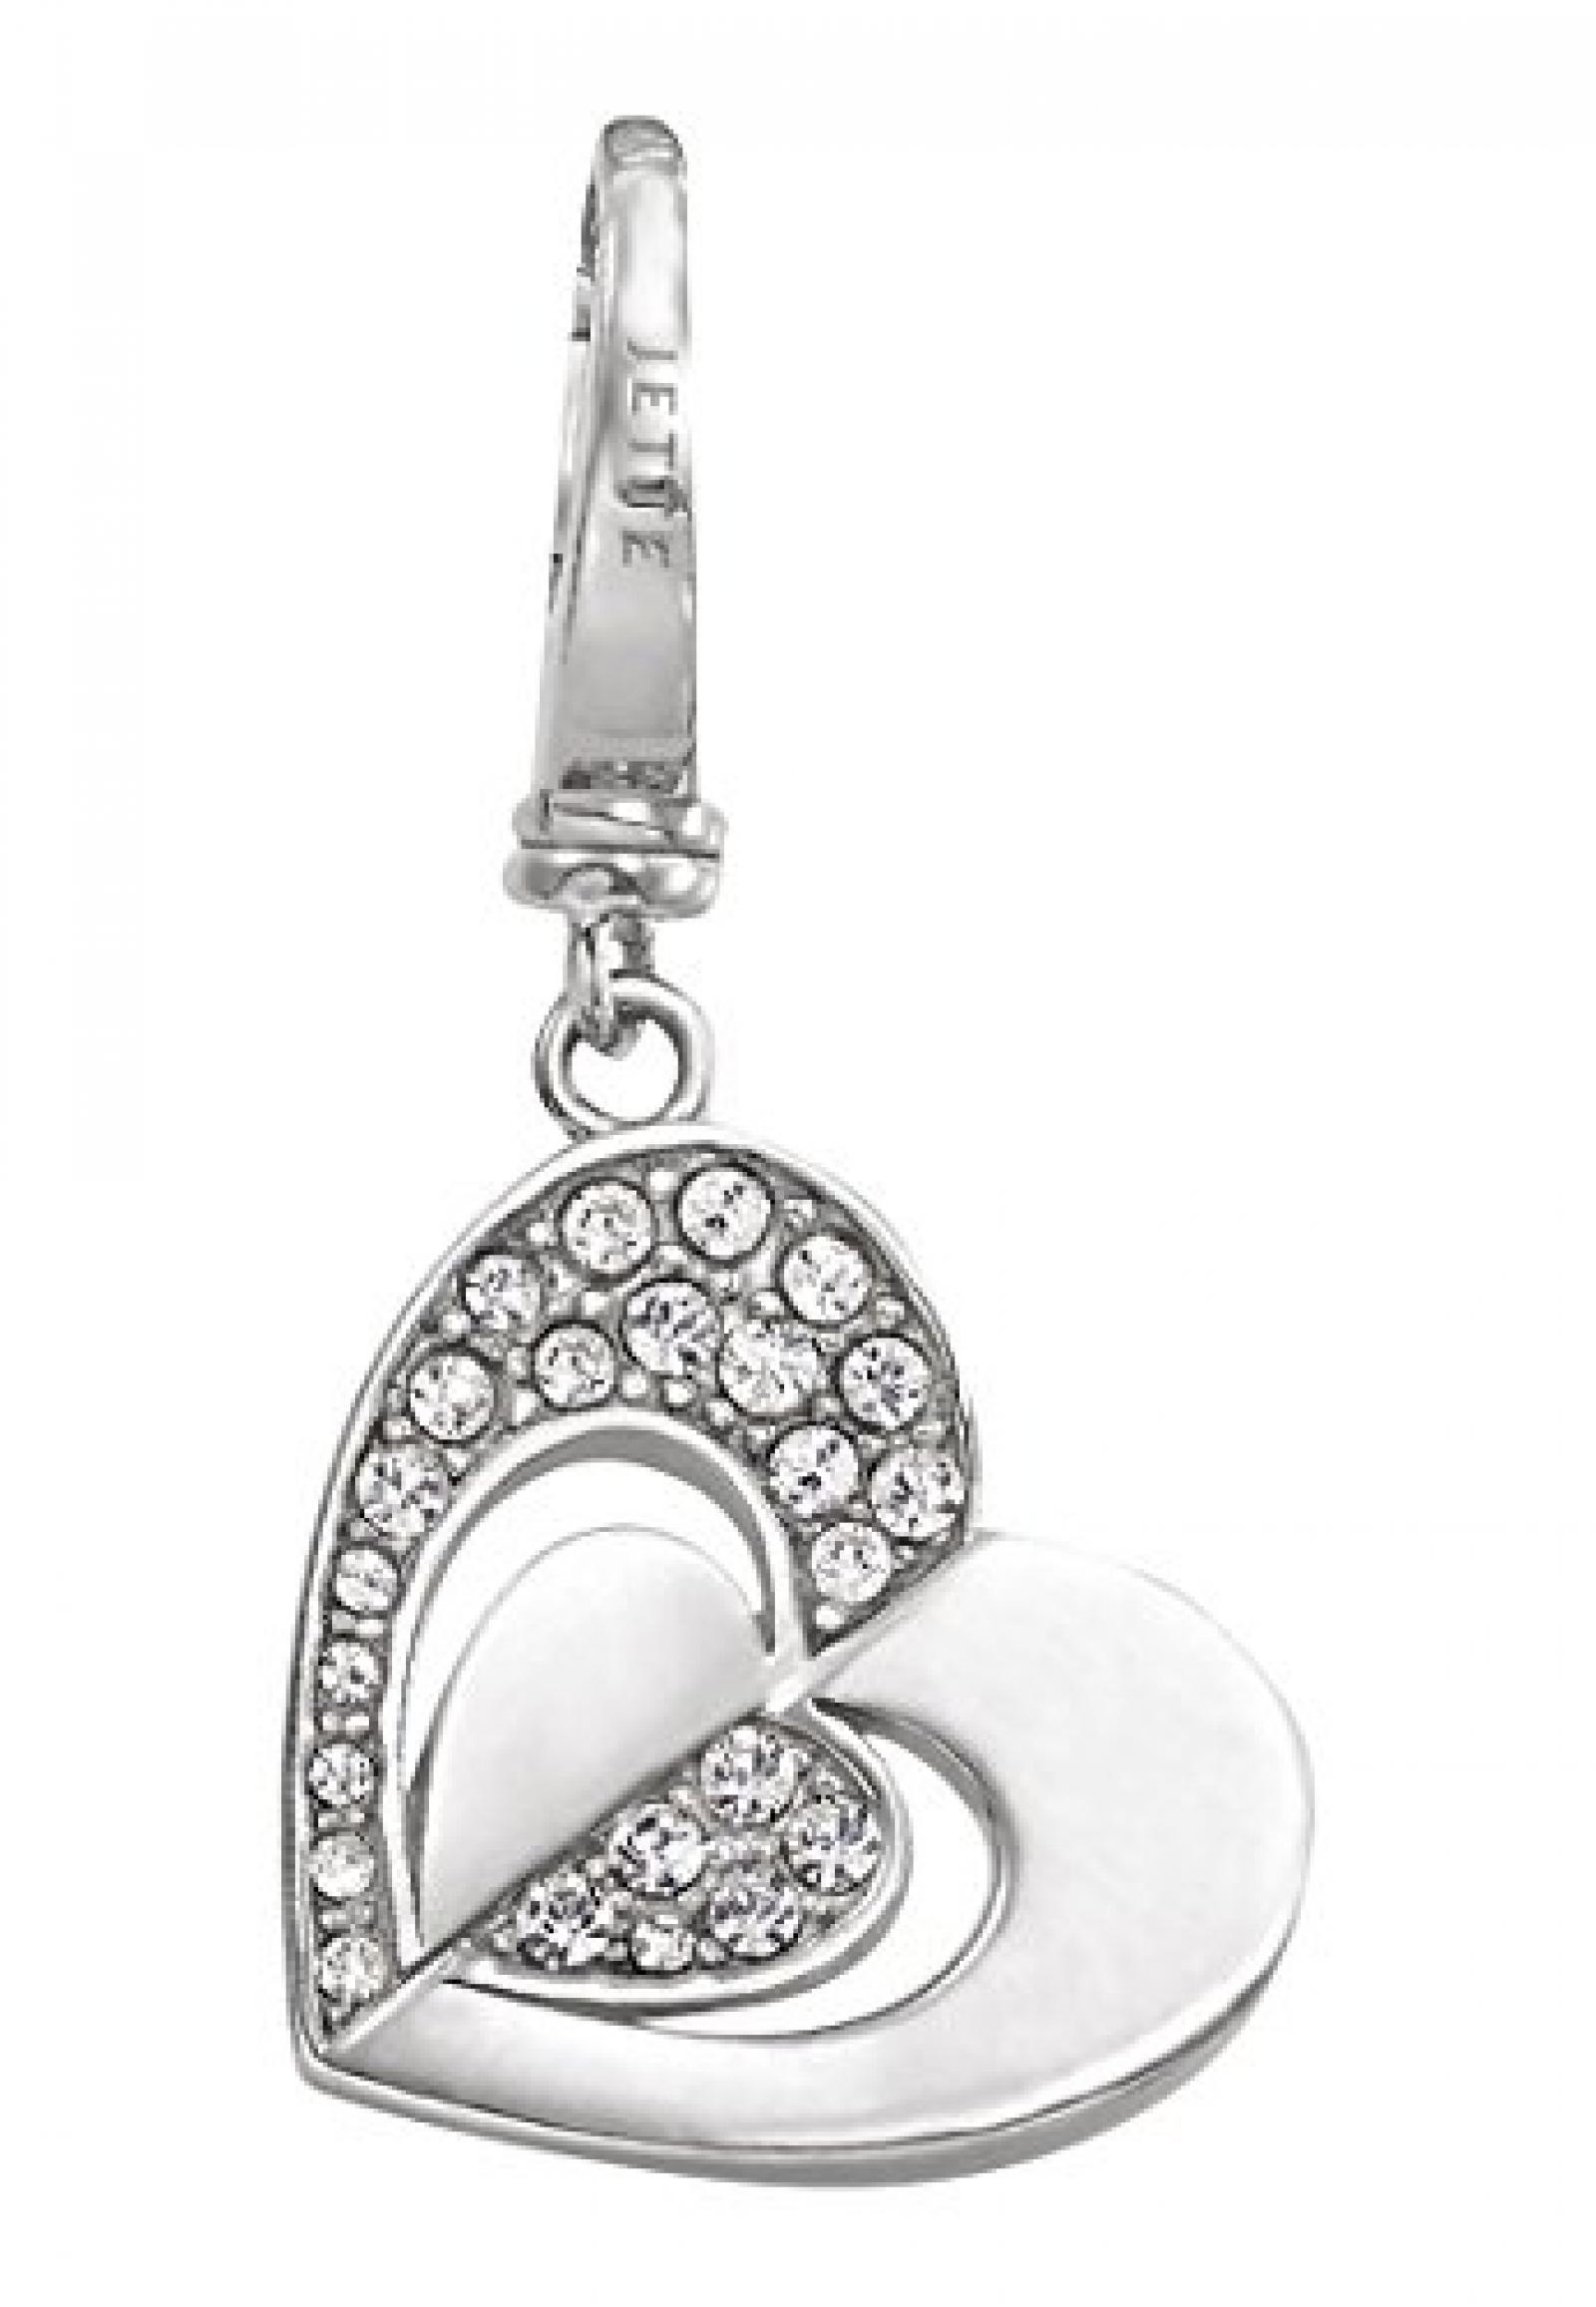 JETTE Charms Damen-Charm Mini-charm Valentin 2014 925er Silber rhodiniert 24 Kristalle One Size, silber